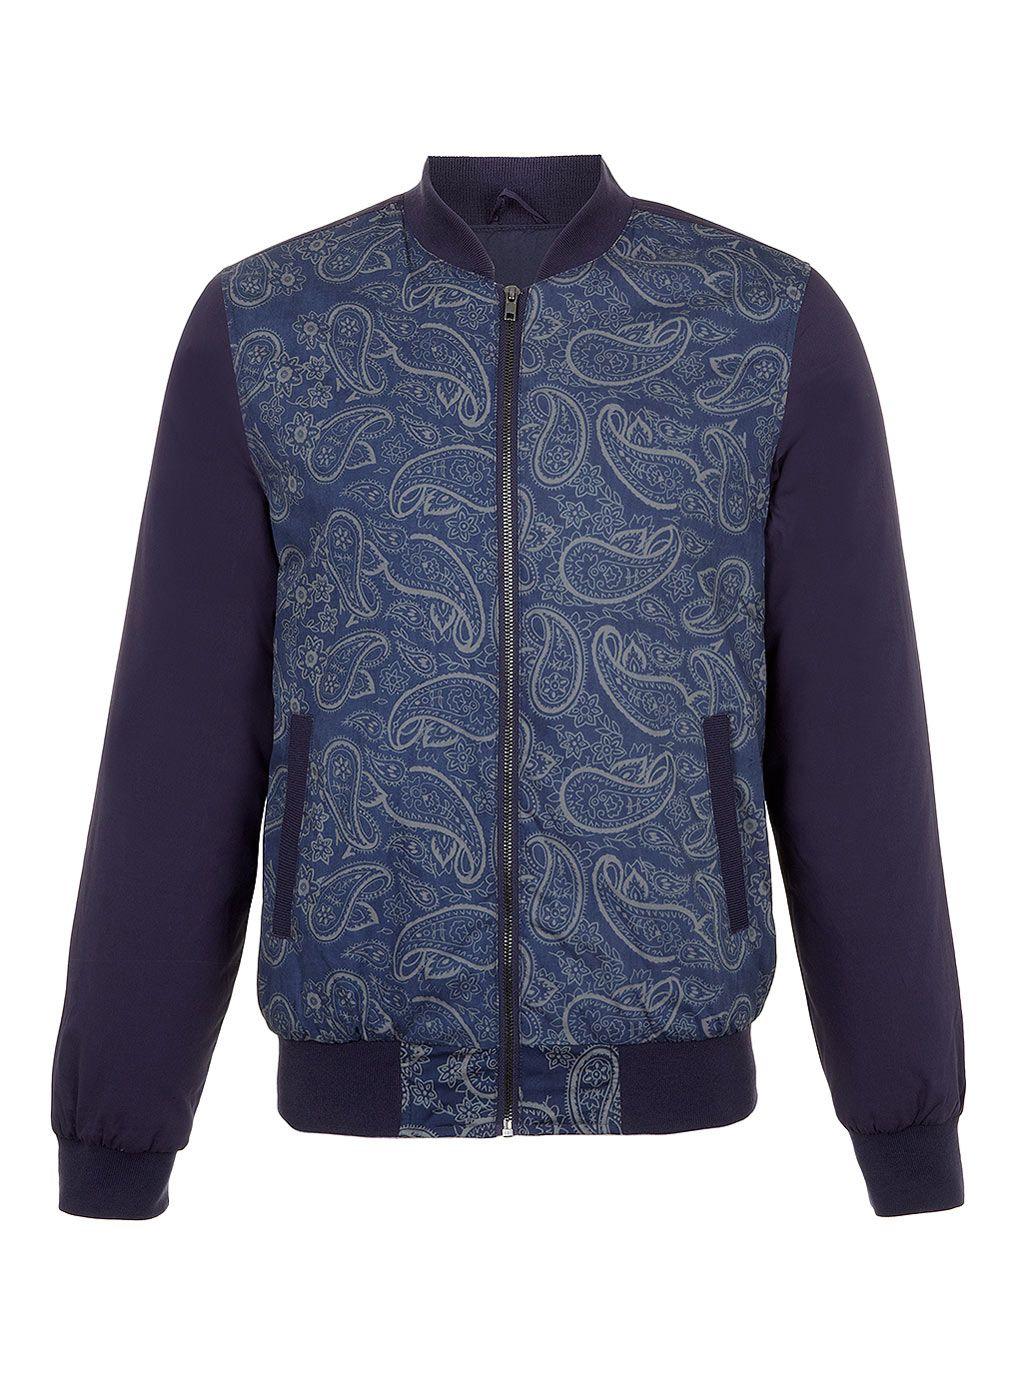 Navy Paisley Bomber Jacket Casual Jackets Men S Coats Jackets Clothing Topman Topman Mens Accessories Fashion Bomber Jacket [ 1384 x 1019 Pixel ]